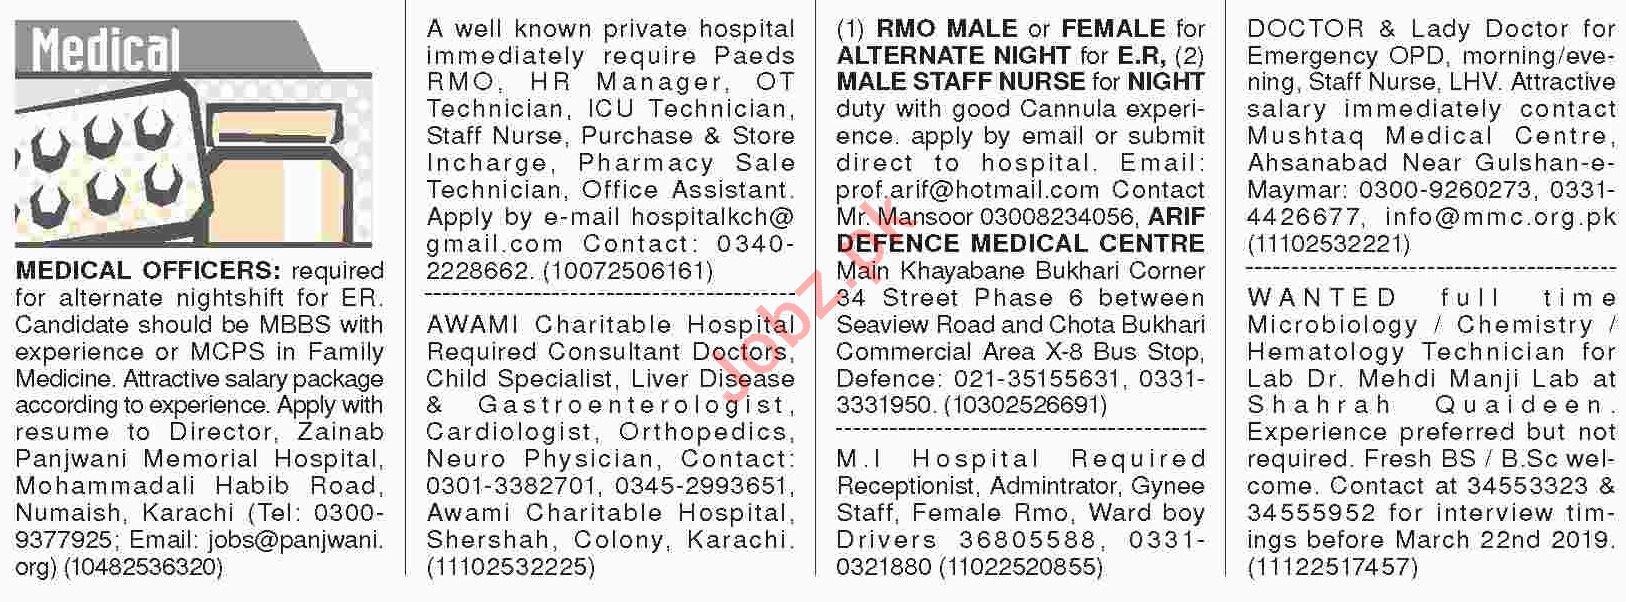 Dawn Sunday Classified Ads 10th March 2019 Medical Staff